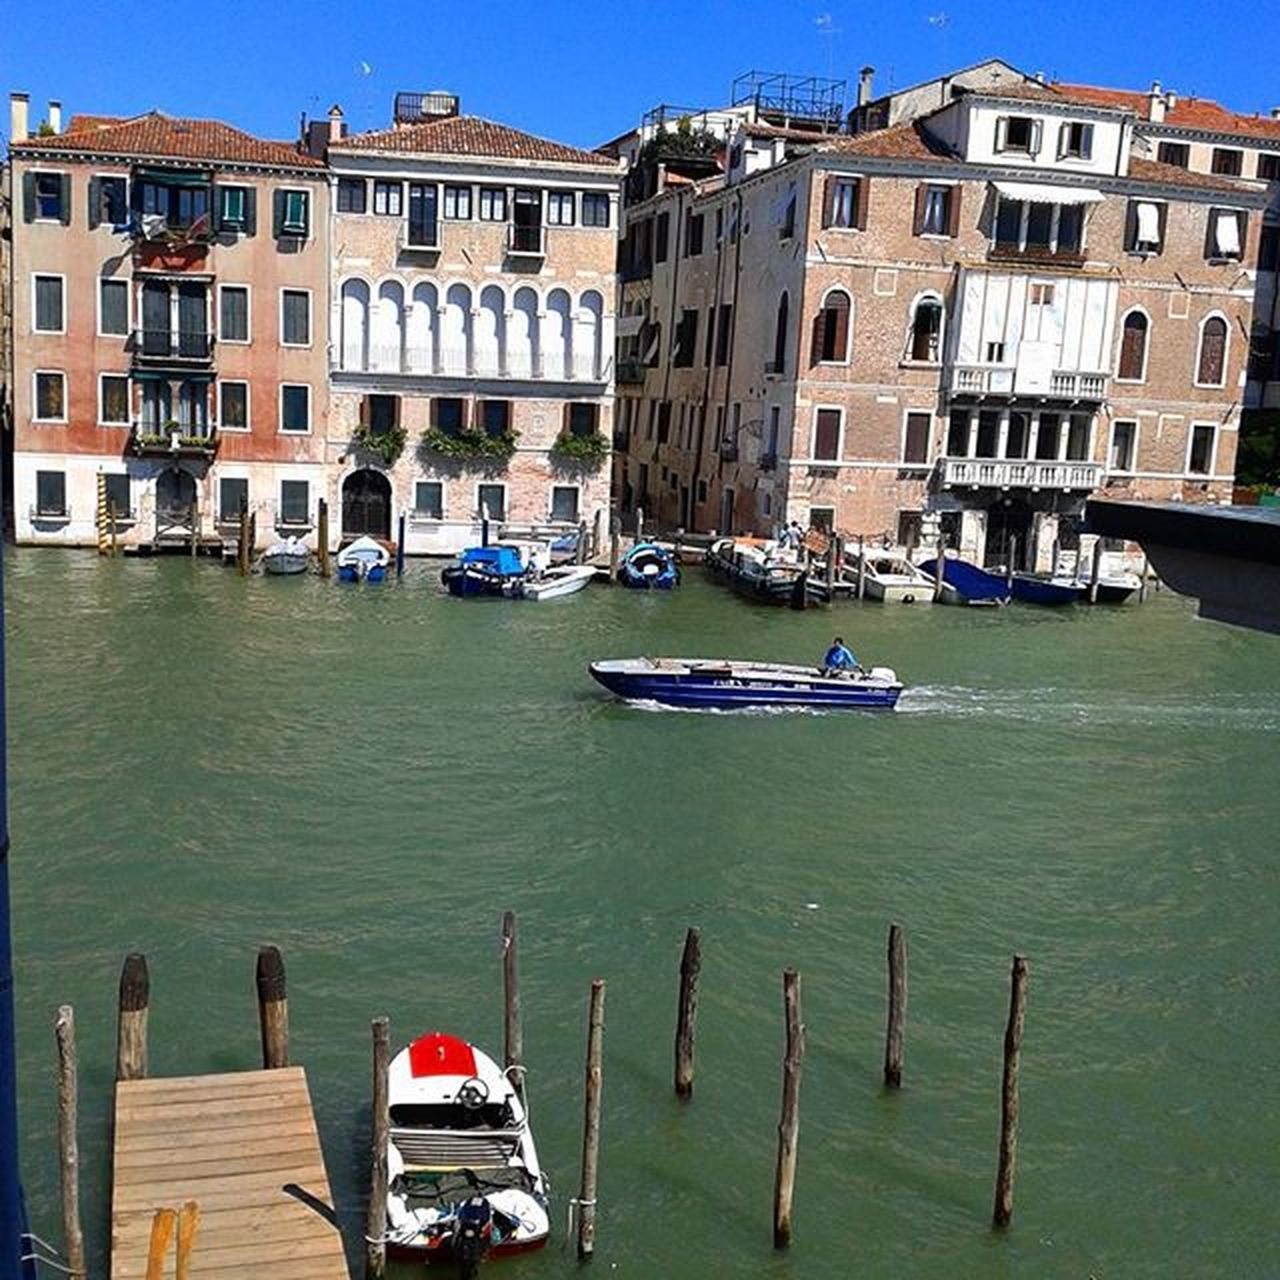 Ig_venice Igersvenezia Igersoftheday Veneziadavivere Veneziagram Water Sunnyday Veneziaunica